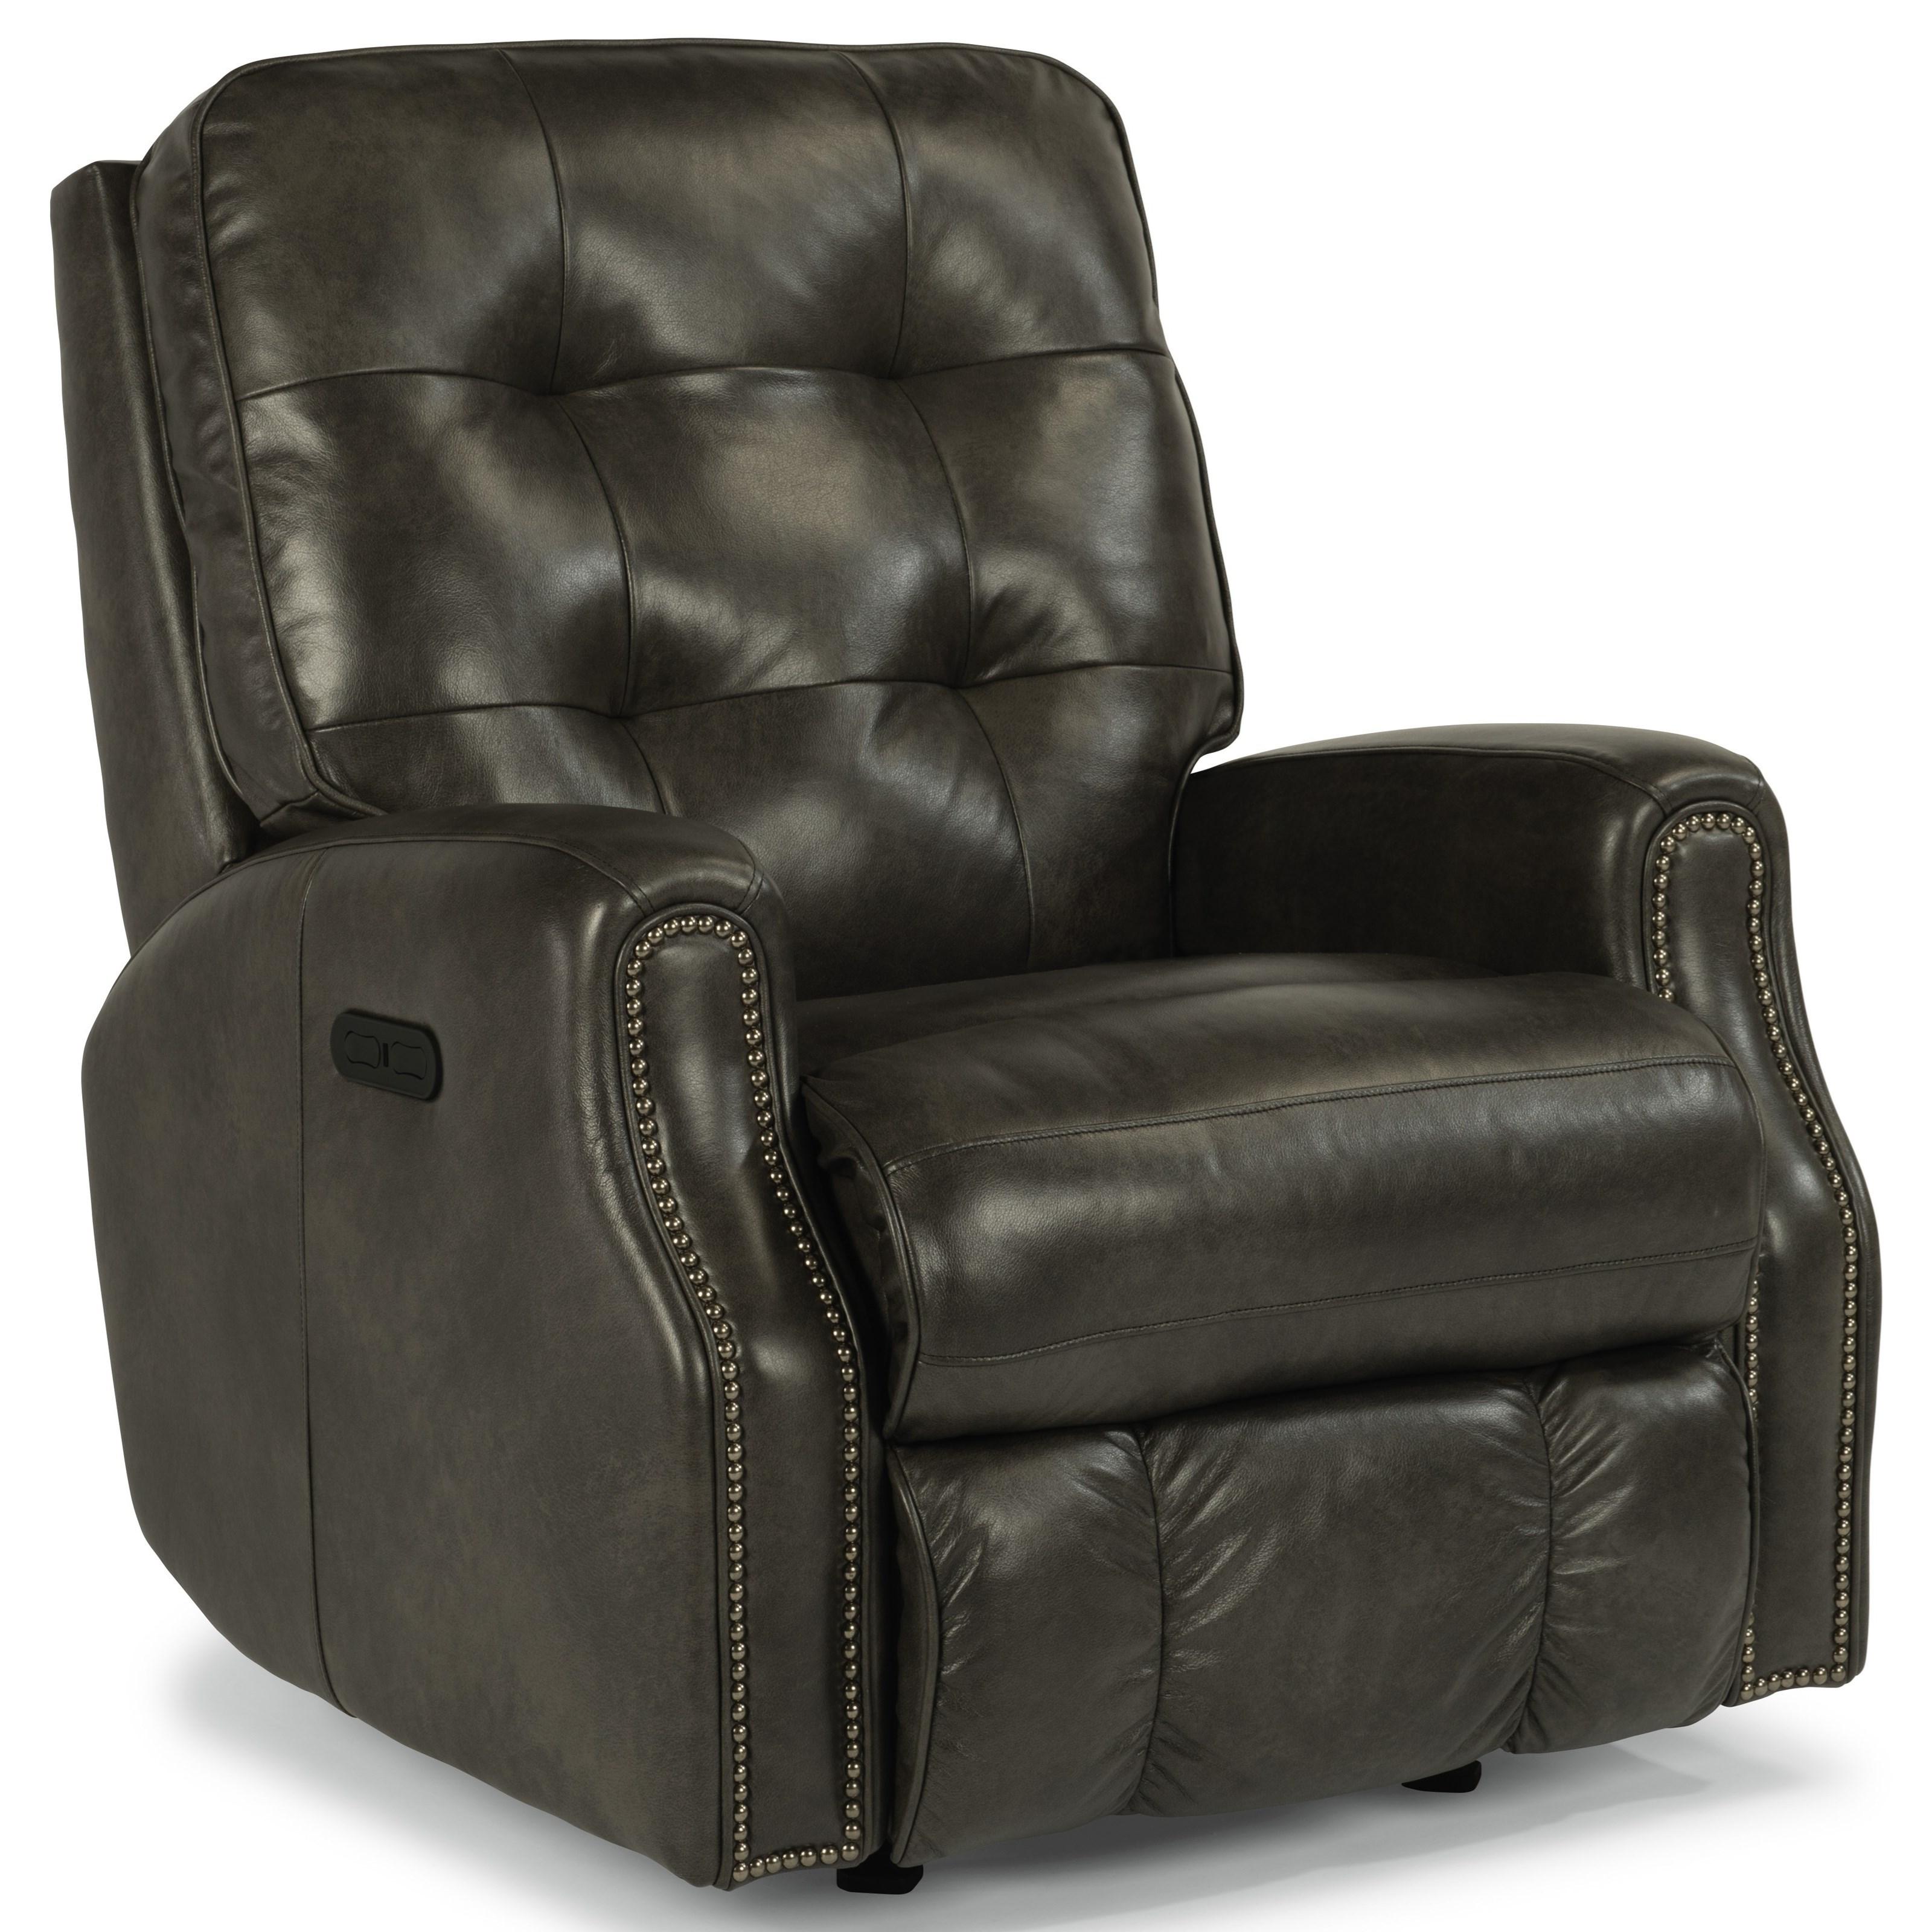 Devon Power Rocker Recliner w/ Power Headrest by Flexsteel at Crowley Furniture & Mattress